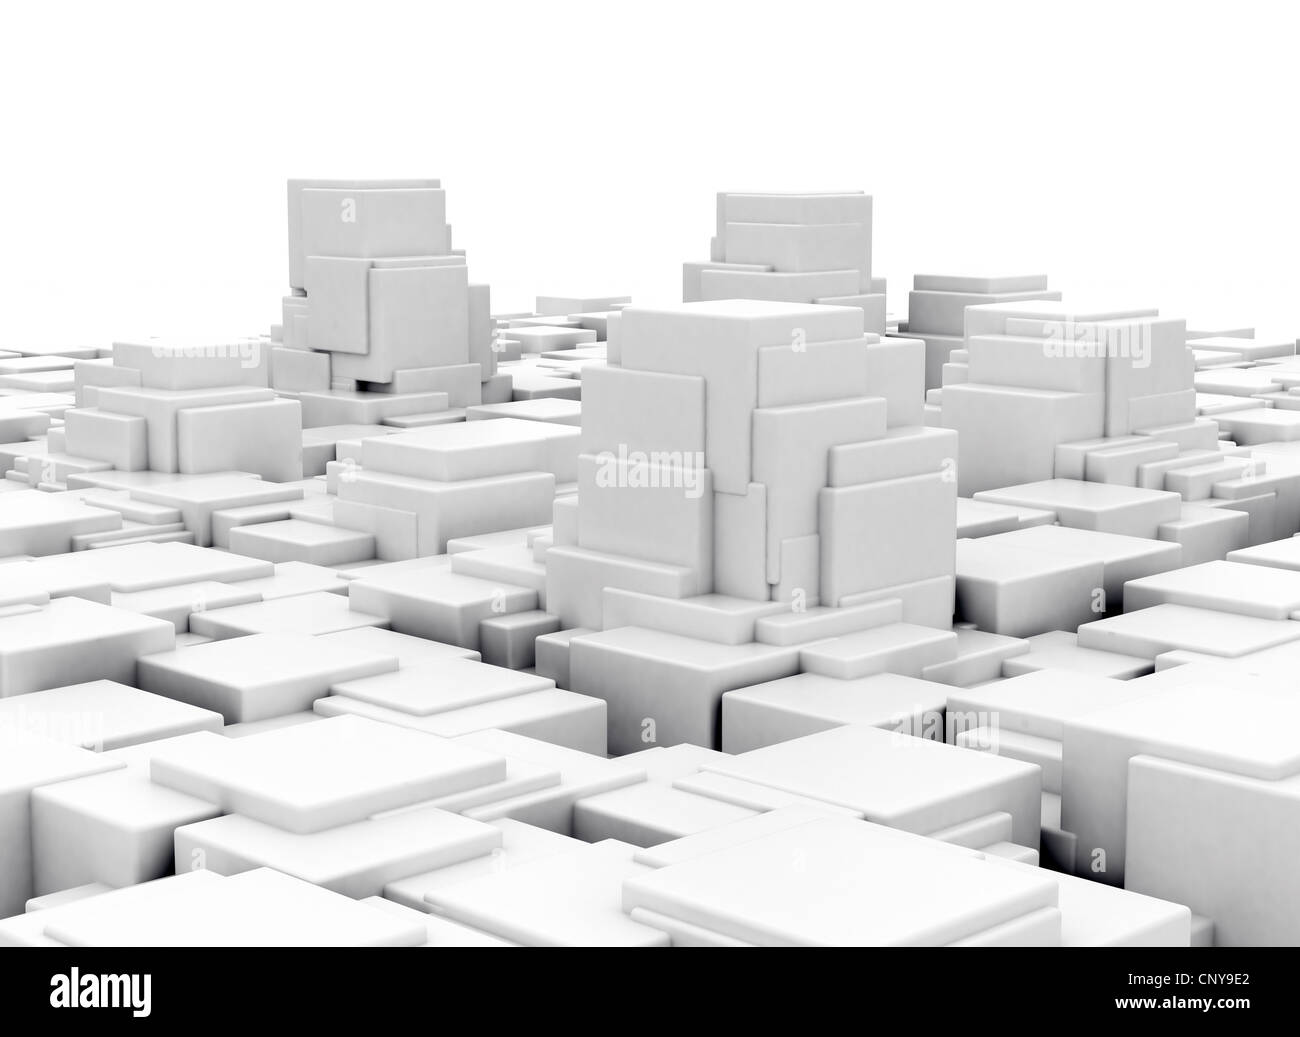 Abstract 3d City Model Futuristic Design